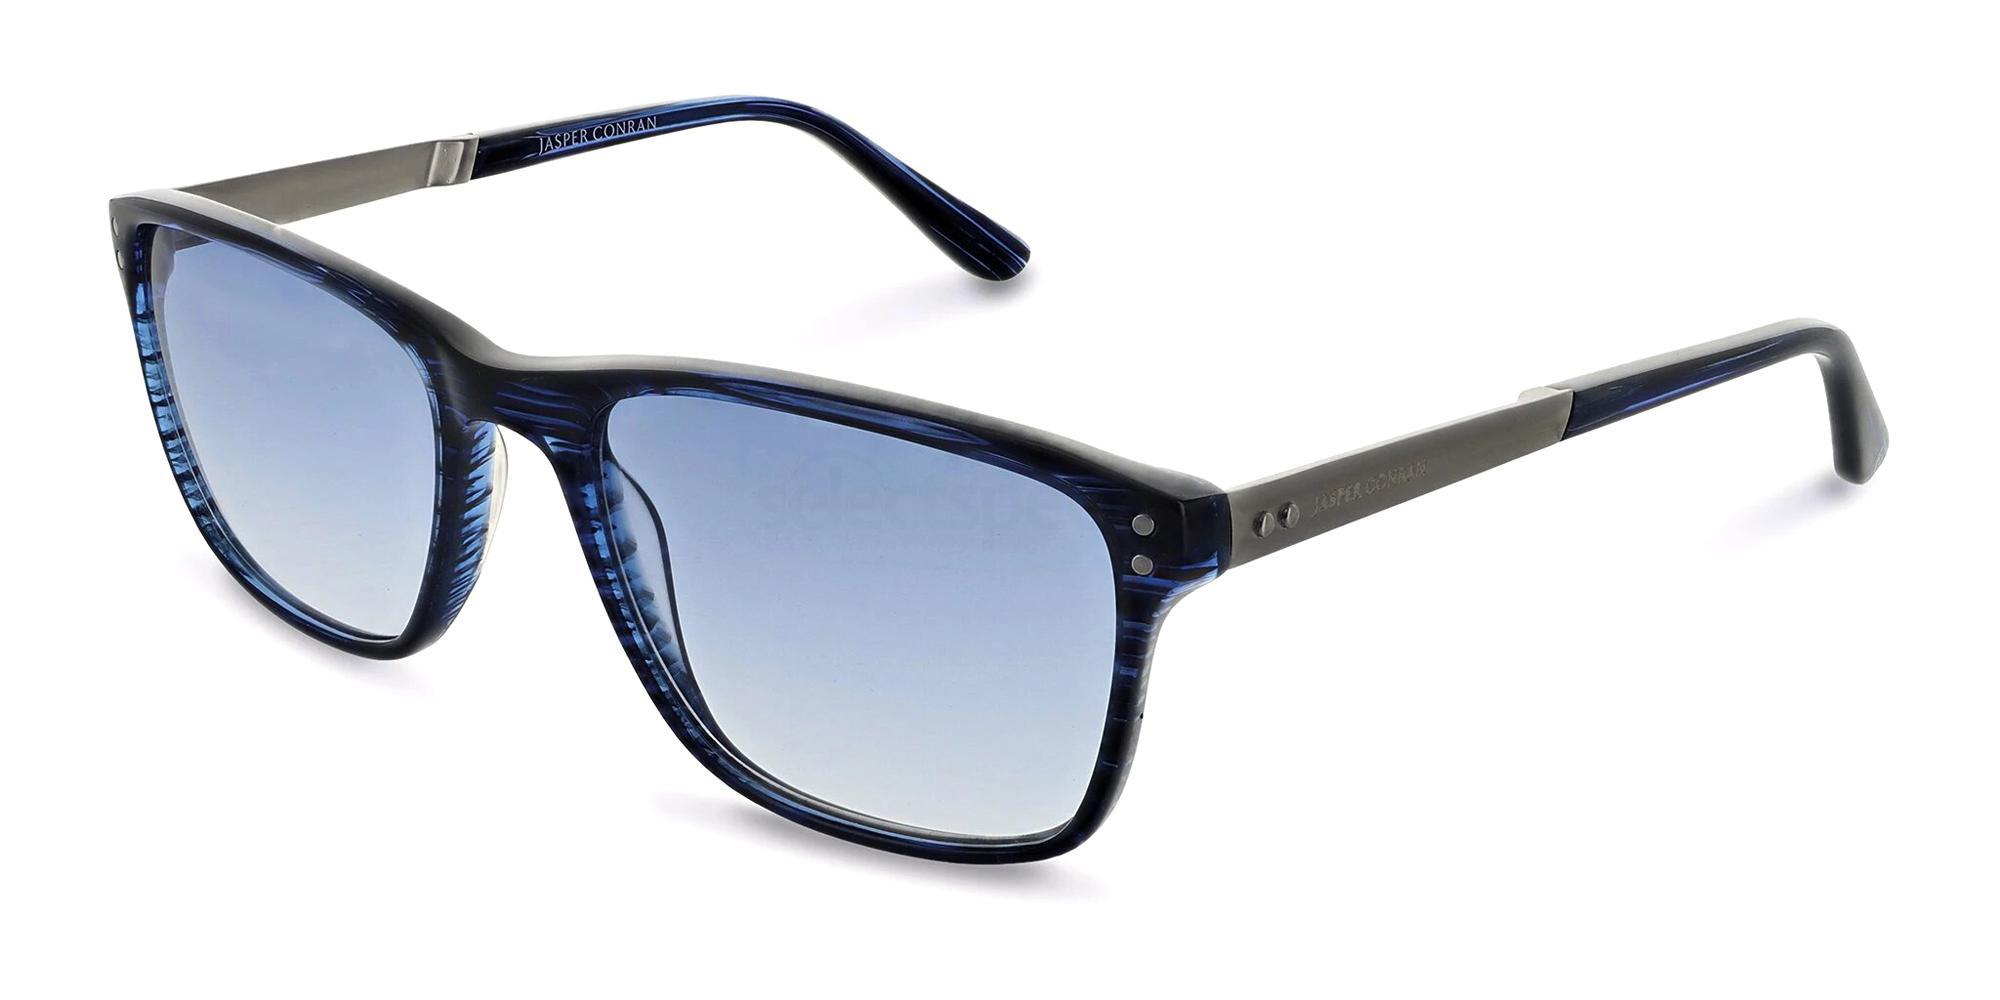 Blue Stripe JCMSUN05 Sunglasses, Jasper Conran